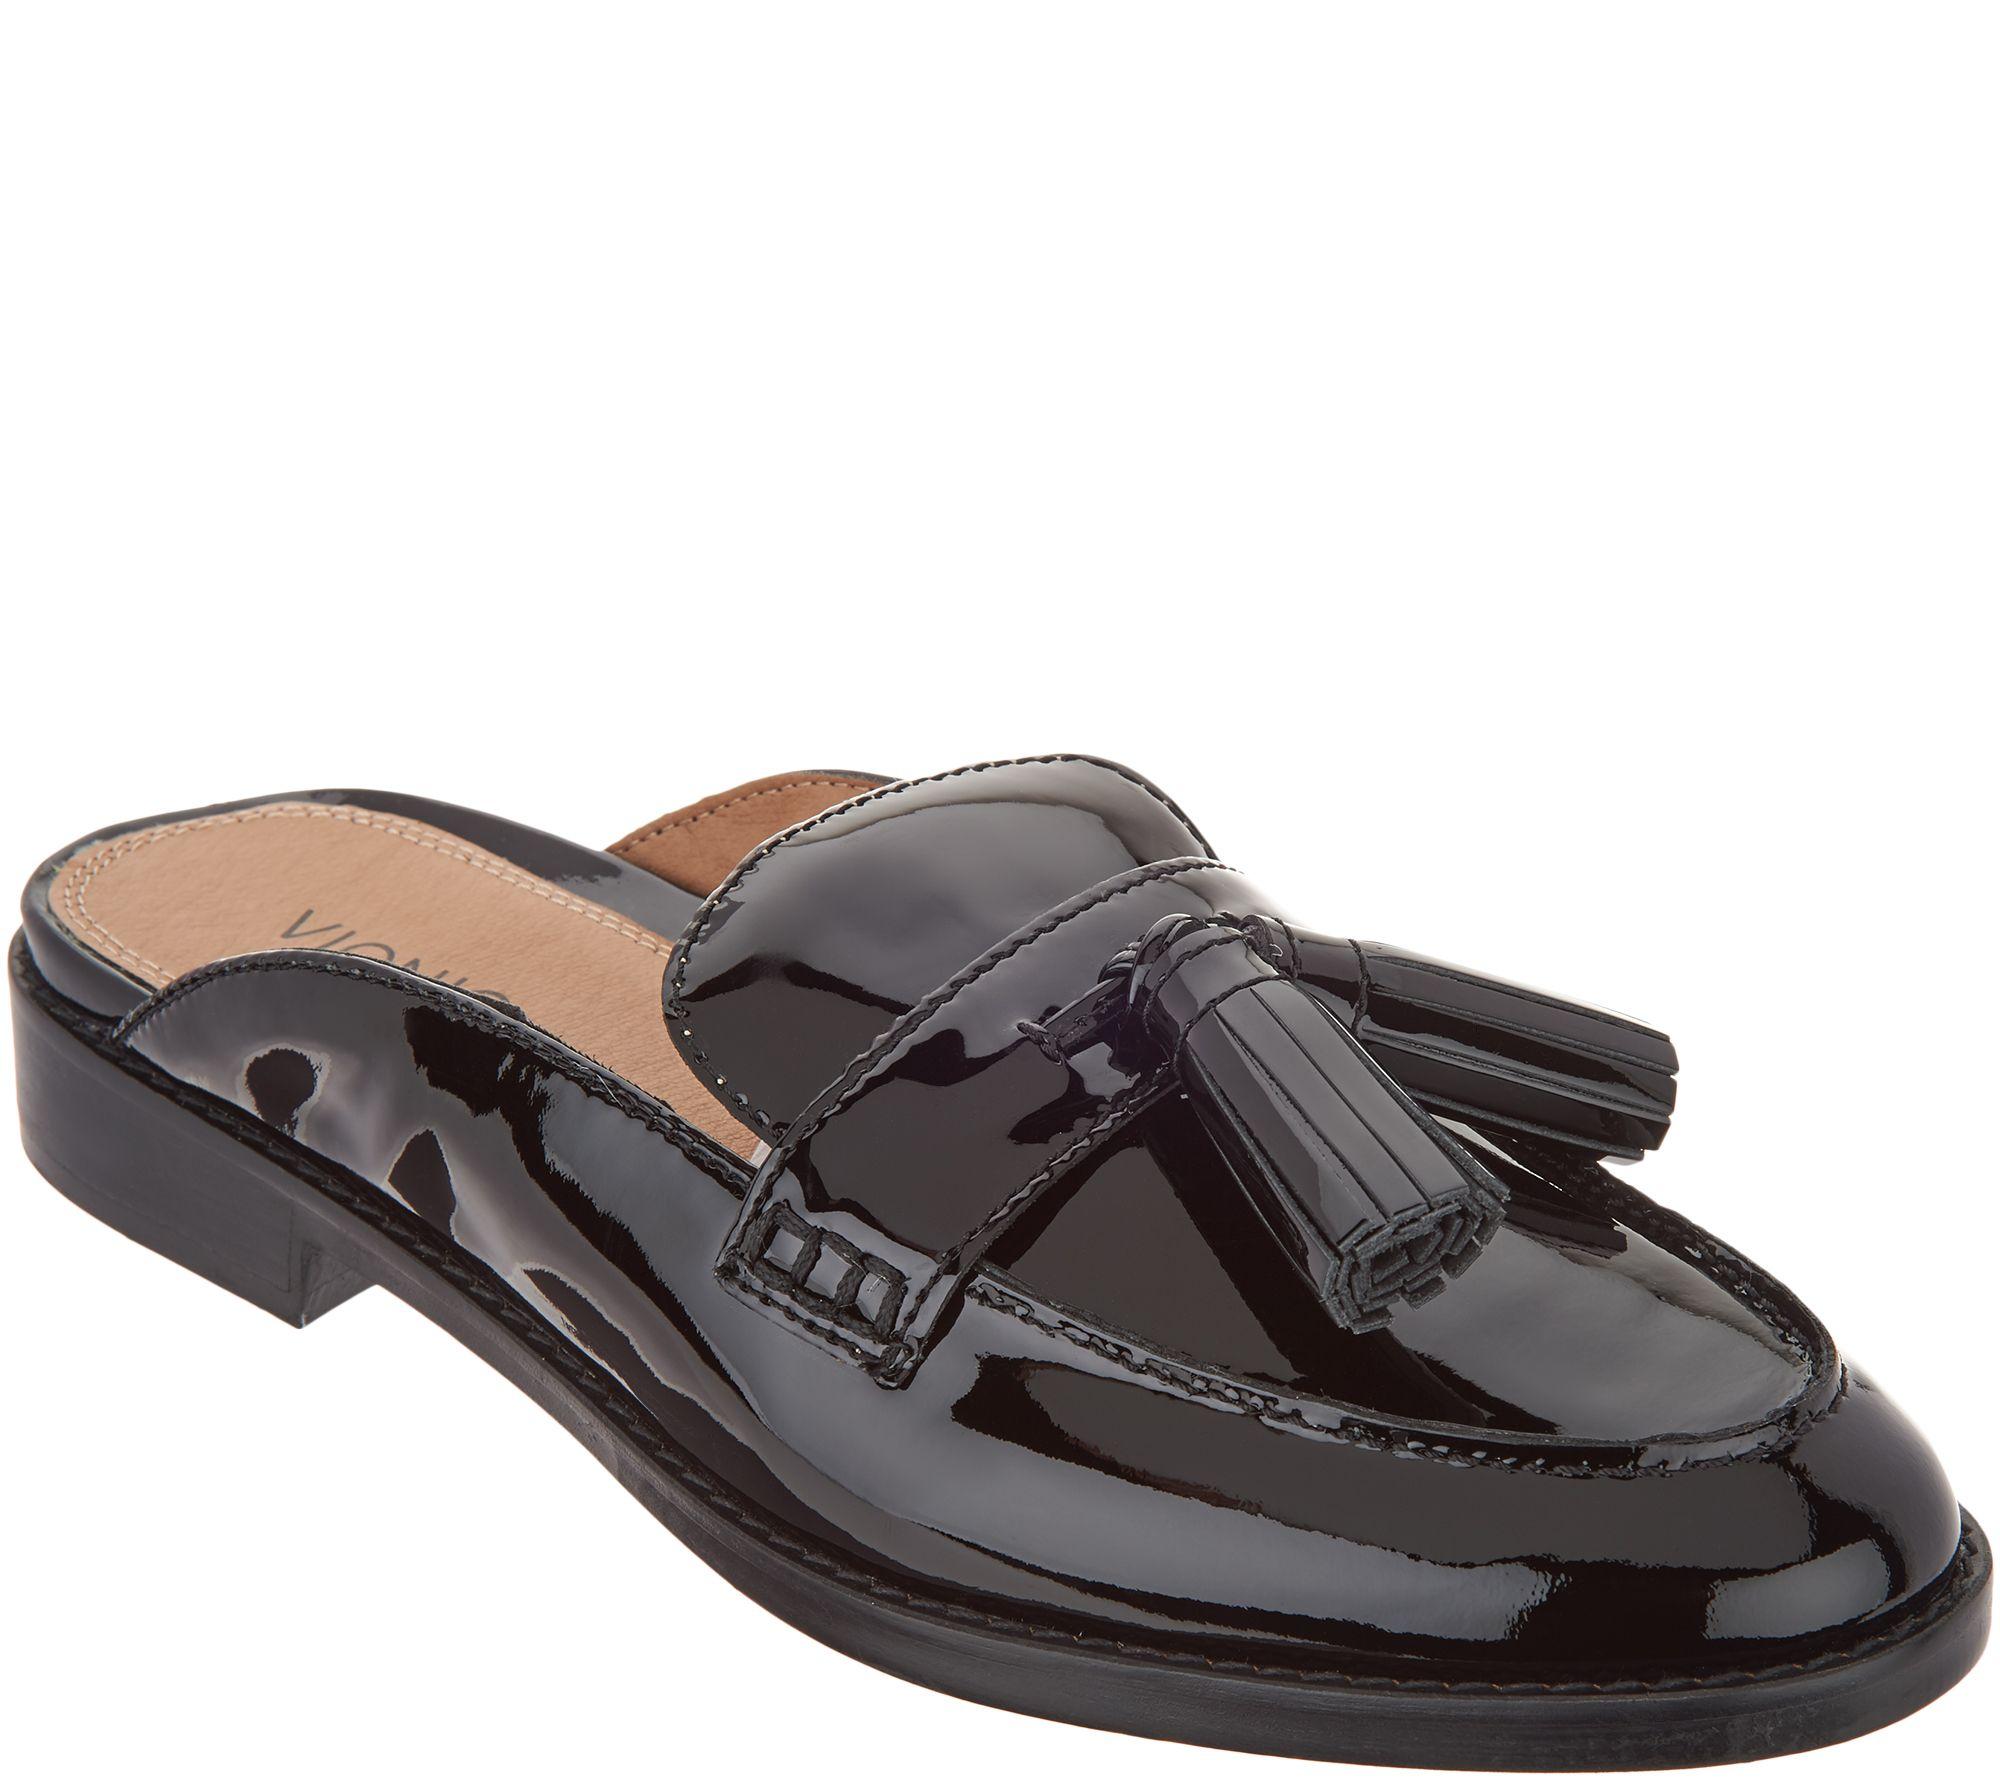 52bbed7479b Vionic Leather Mules with Tassel - Reagan — QVC.com